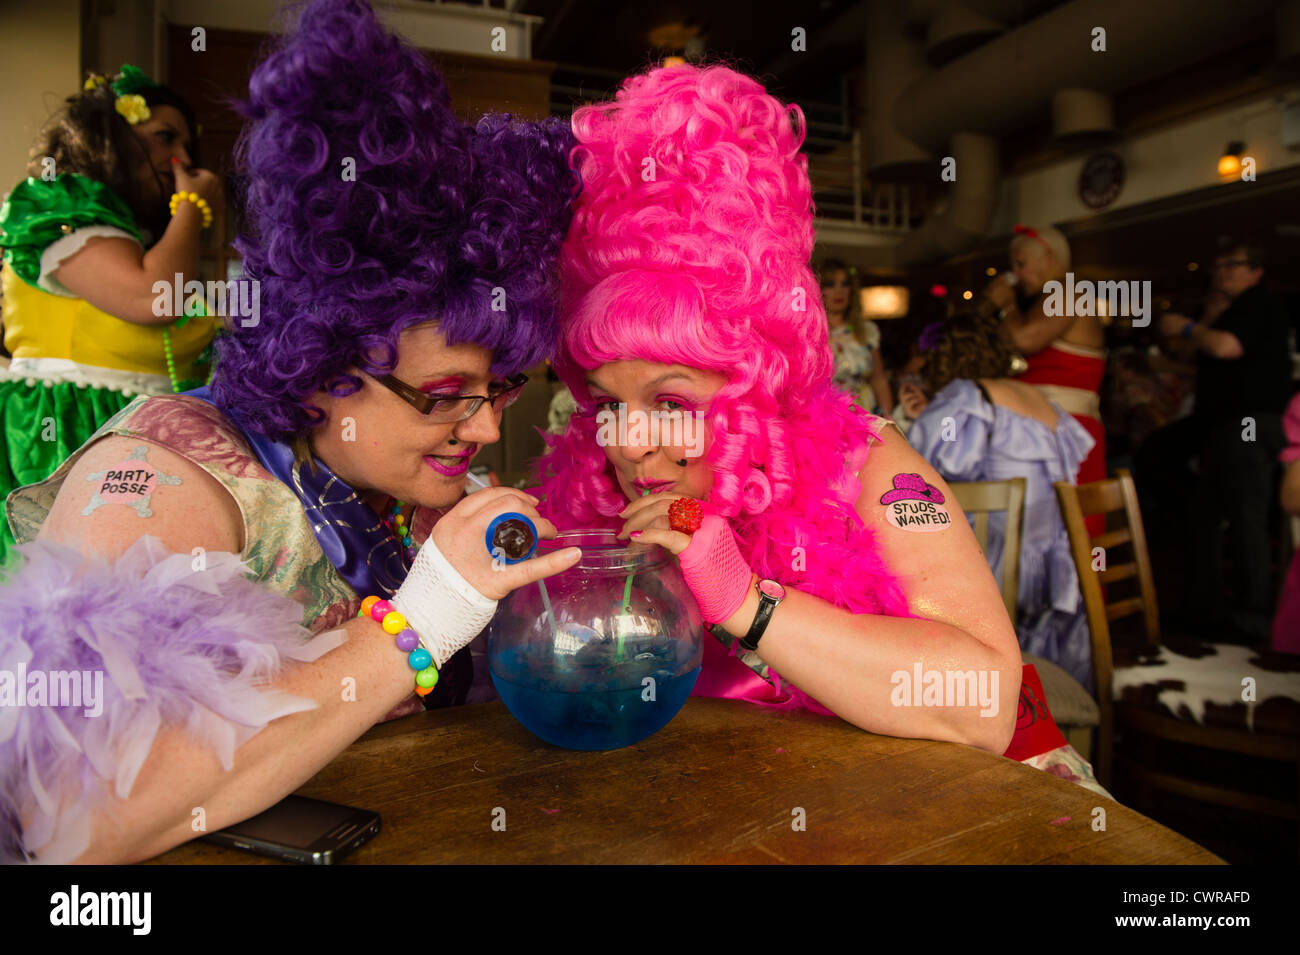 Women on a fancy dress bad taste ball gowns themed hen night party pub crawl, Aberystwyth Wales UK - Stock Image